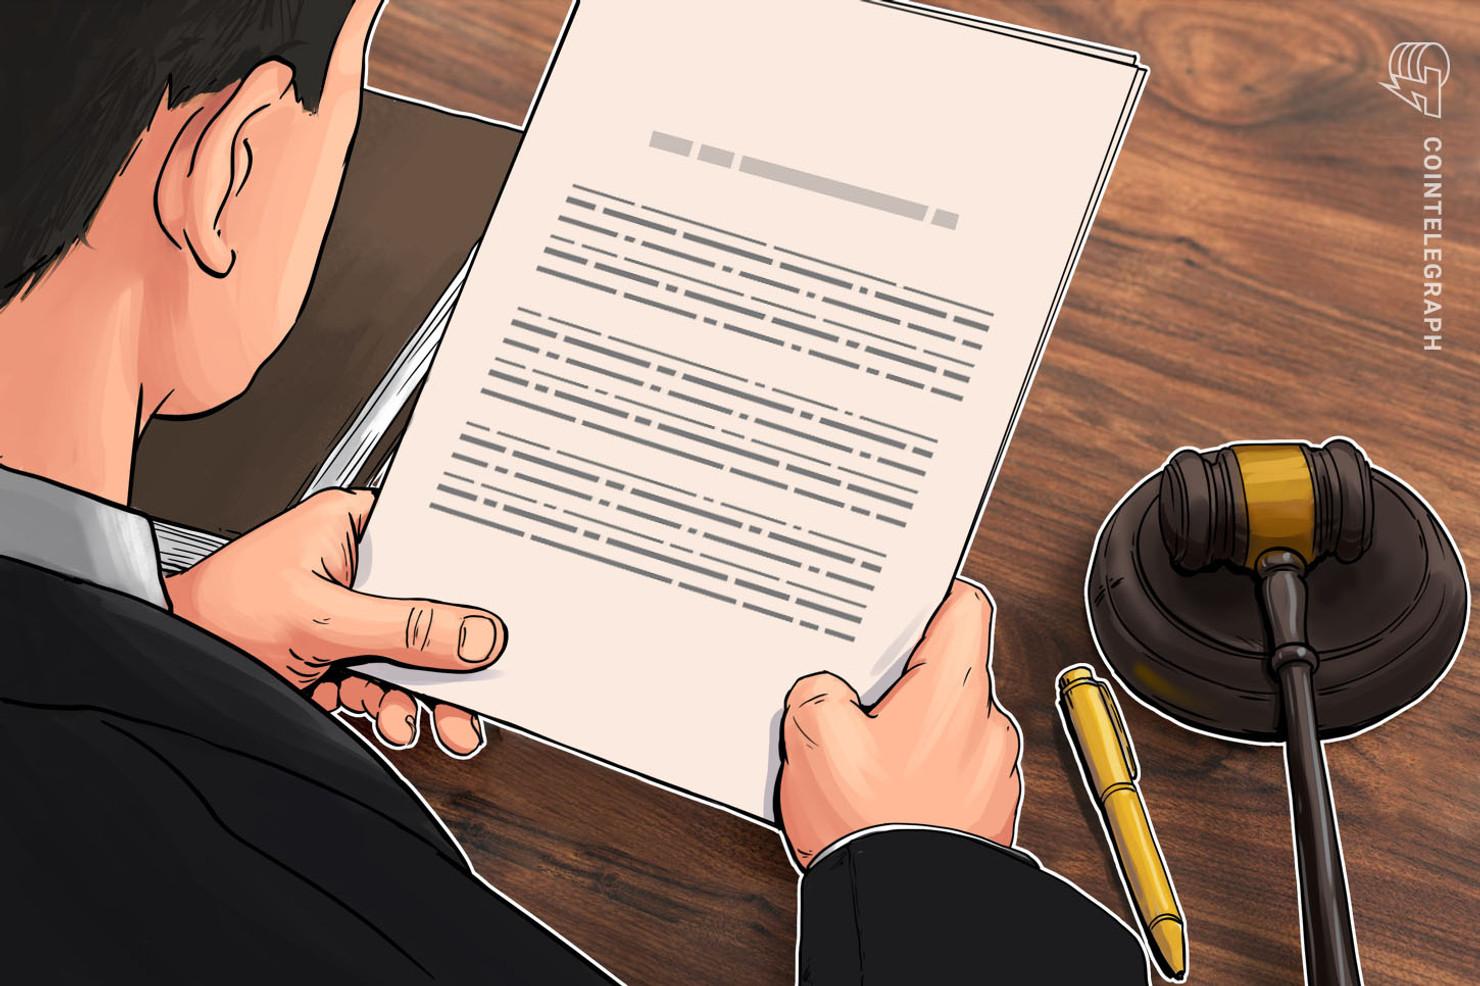 Israel: Institute Sues Professor for Alleged Blockchain Intellectual Property Violation